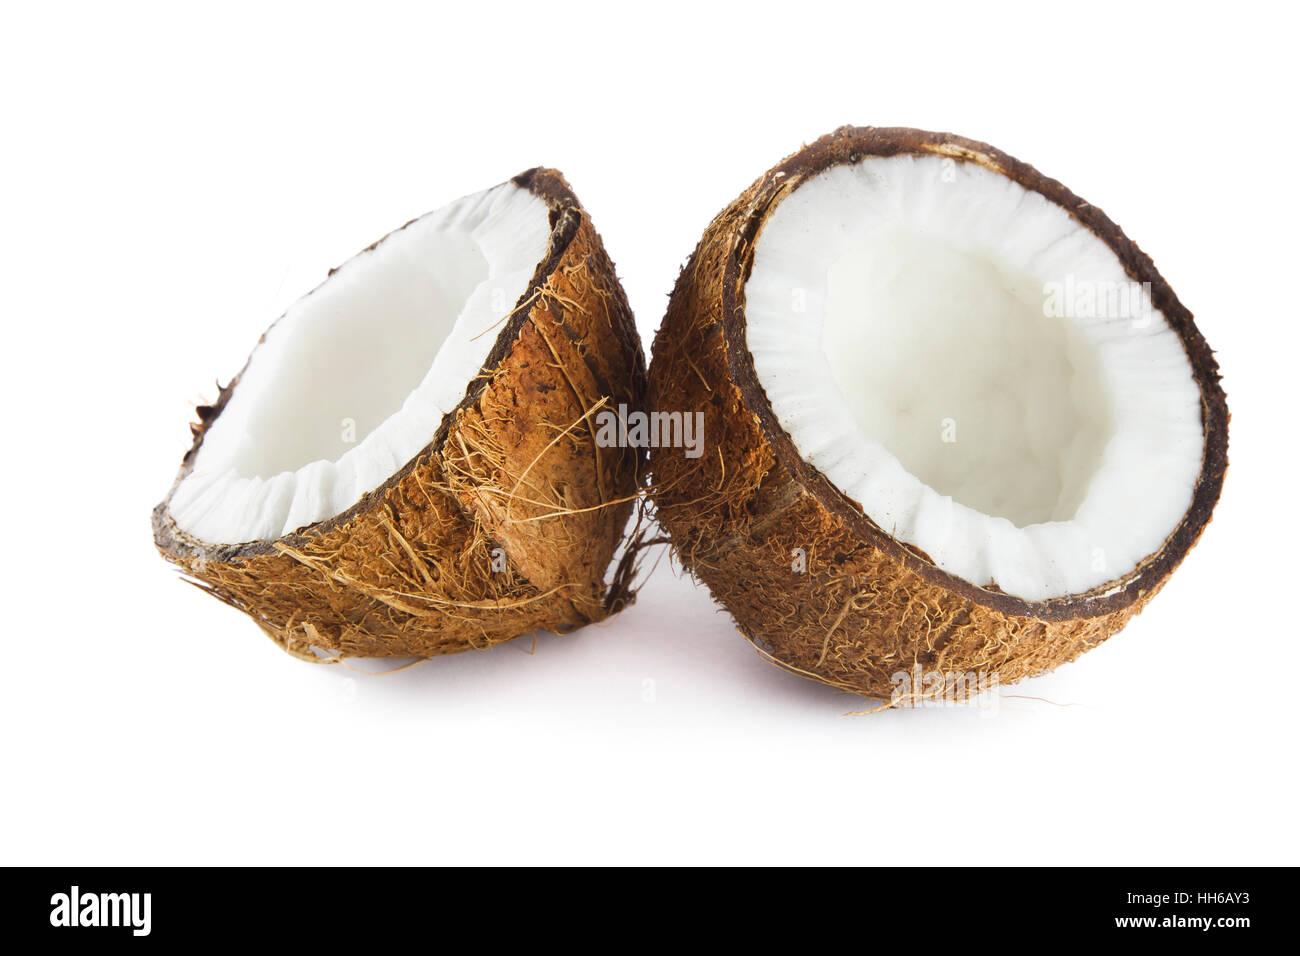 Coconut isolated on white background - Stock Image